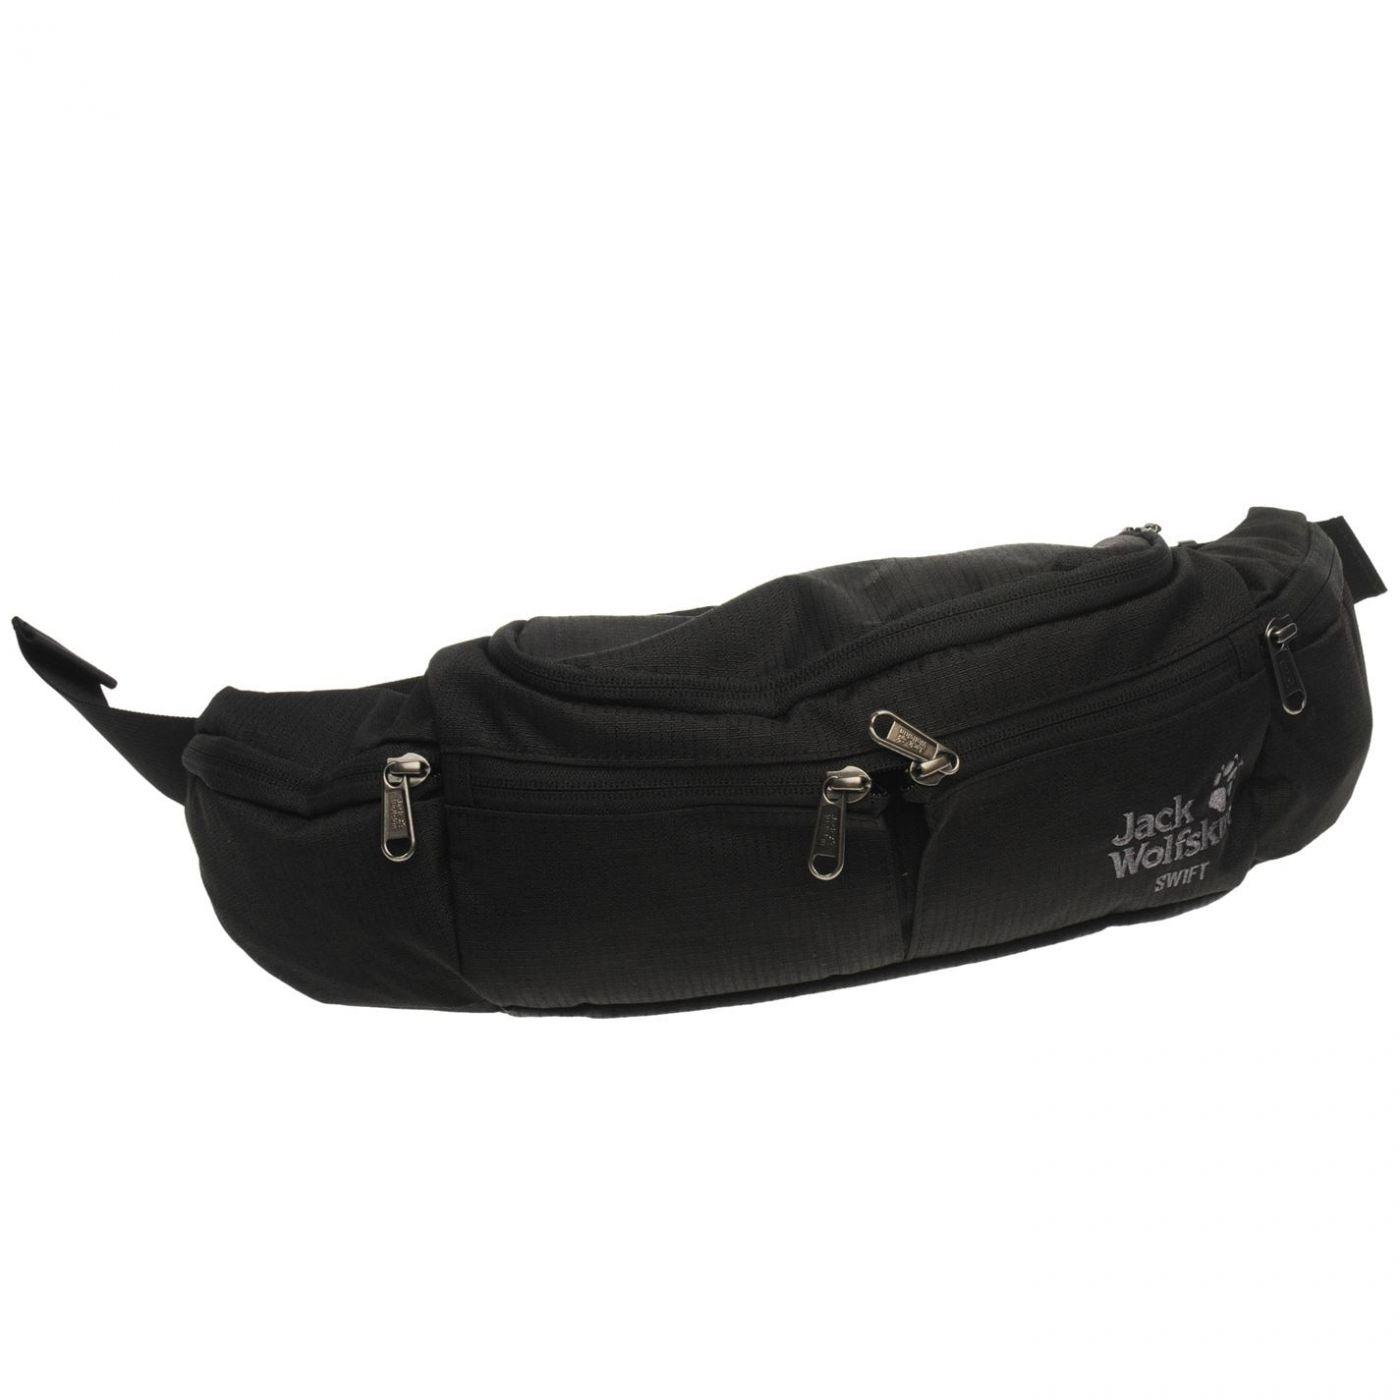 Jack Wolfskin Swift Belt Bag